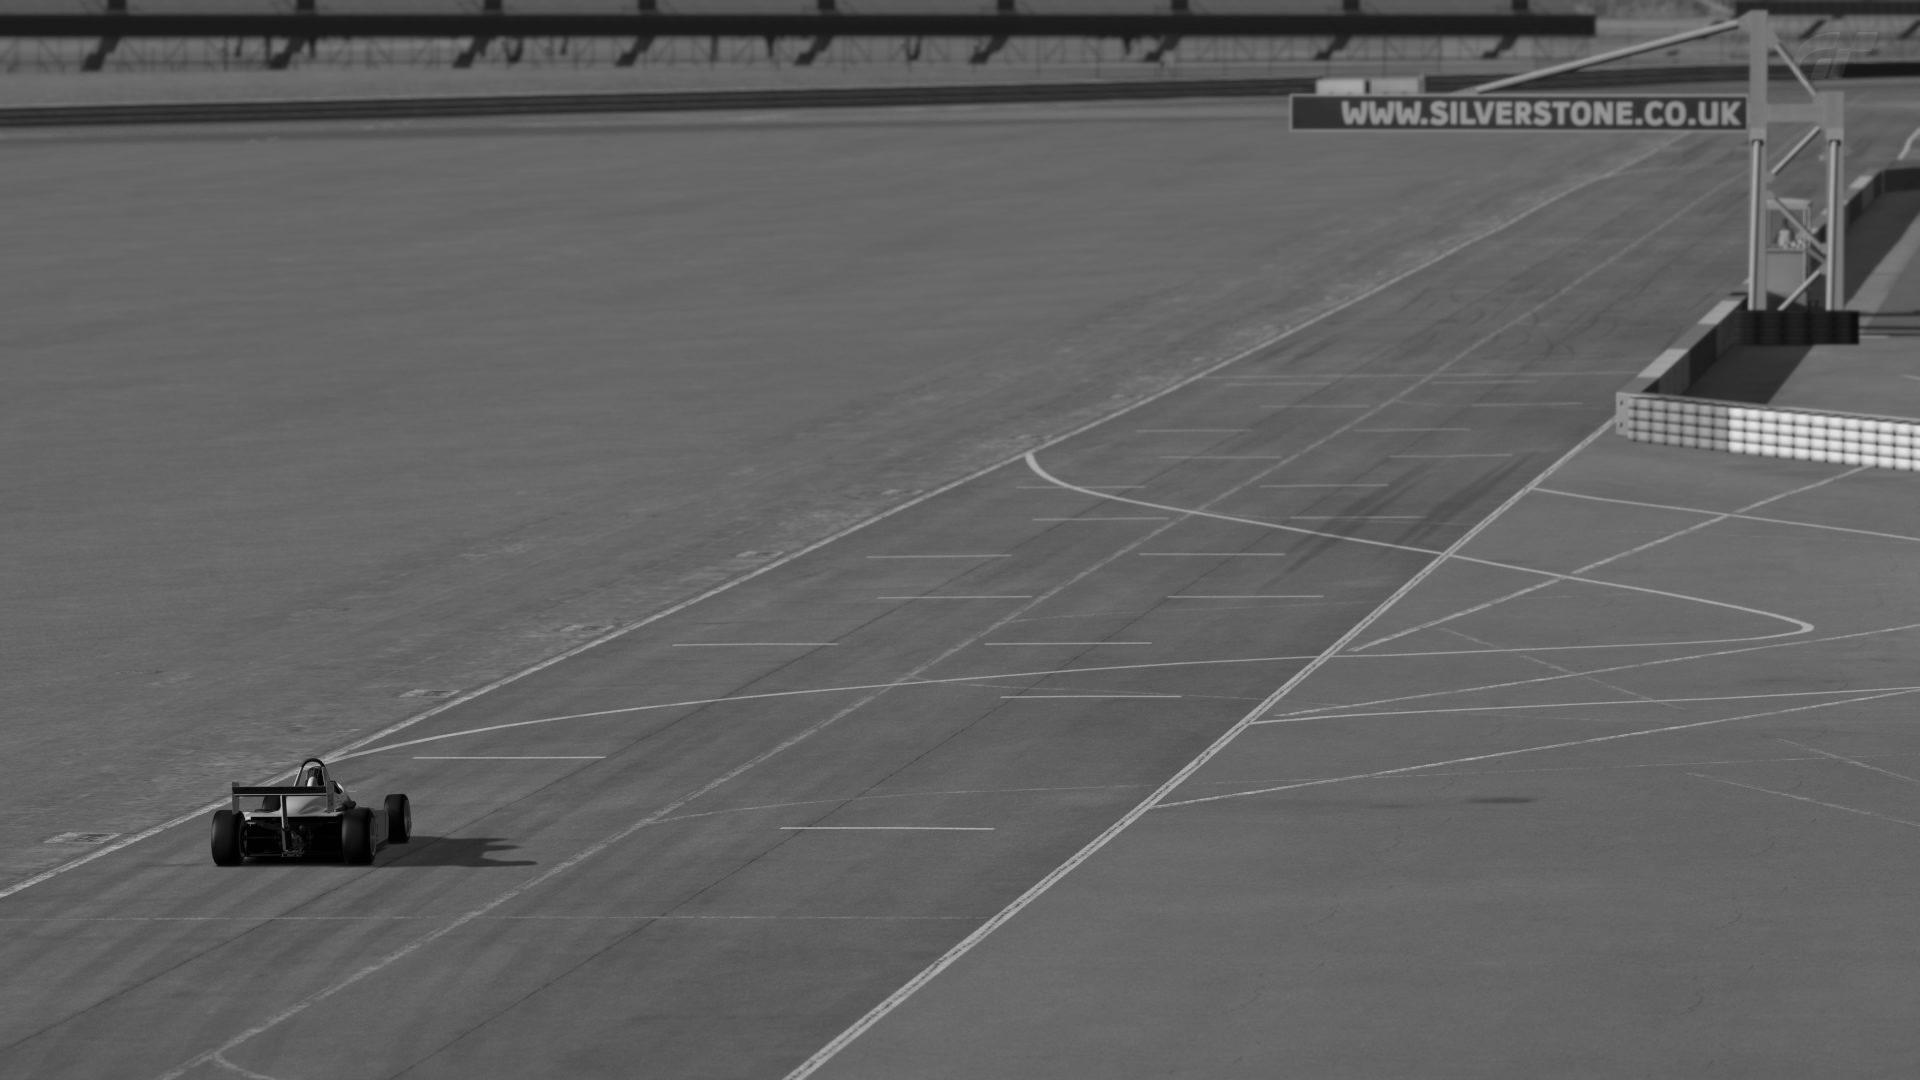 Silverstone_ Stowe Circuit_1.jpg